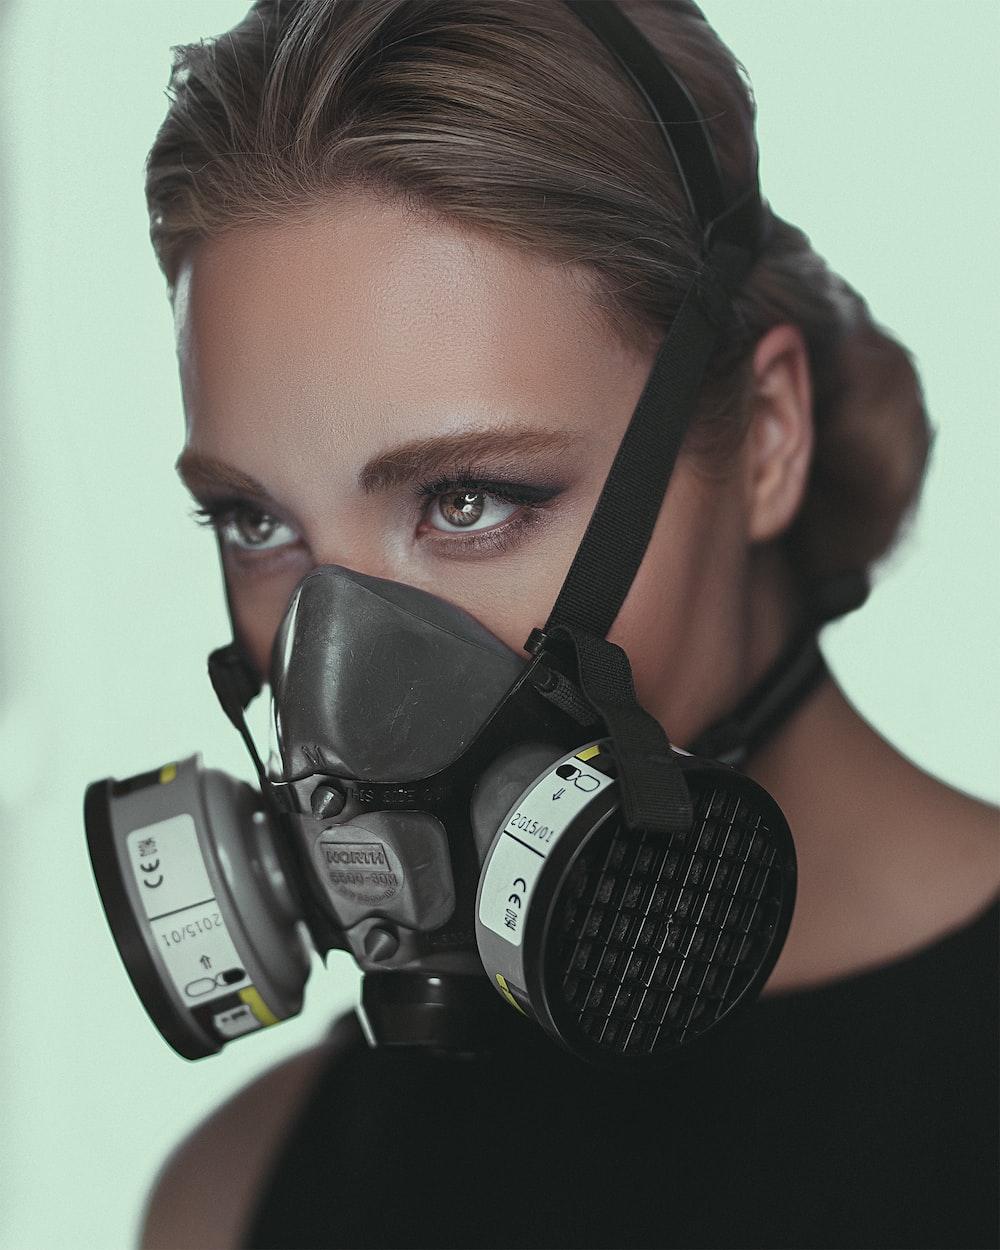 Respirator Free Wearing Photo Headset Unsplash On Gray Woman Image –